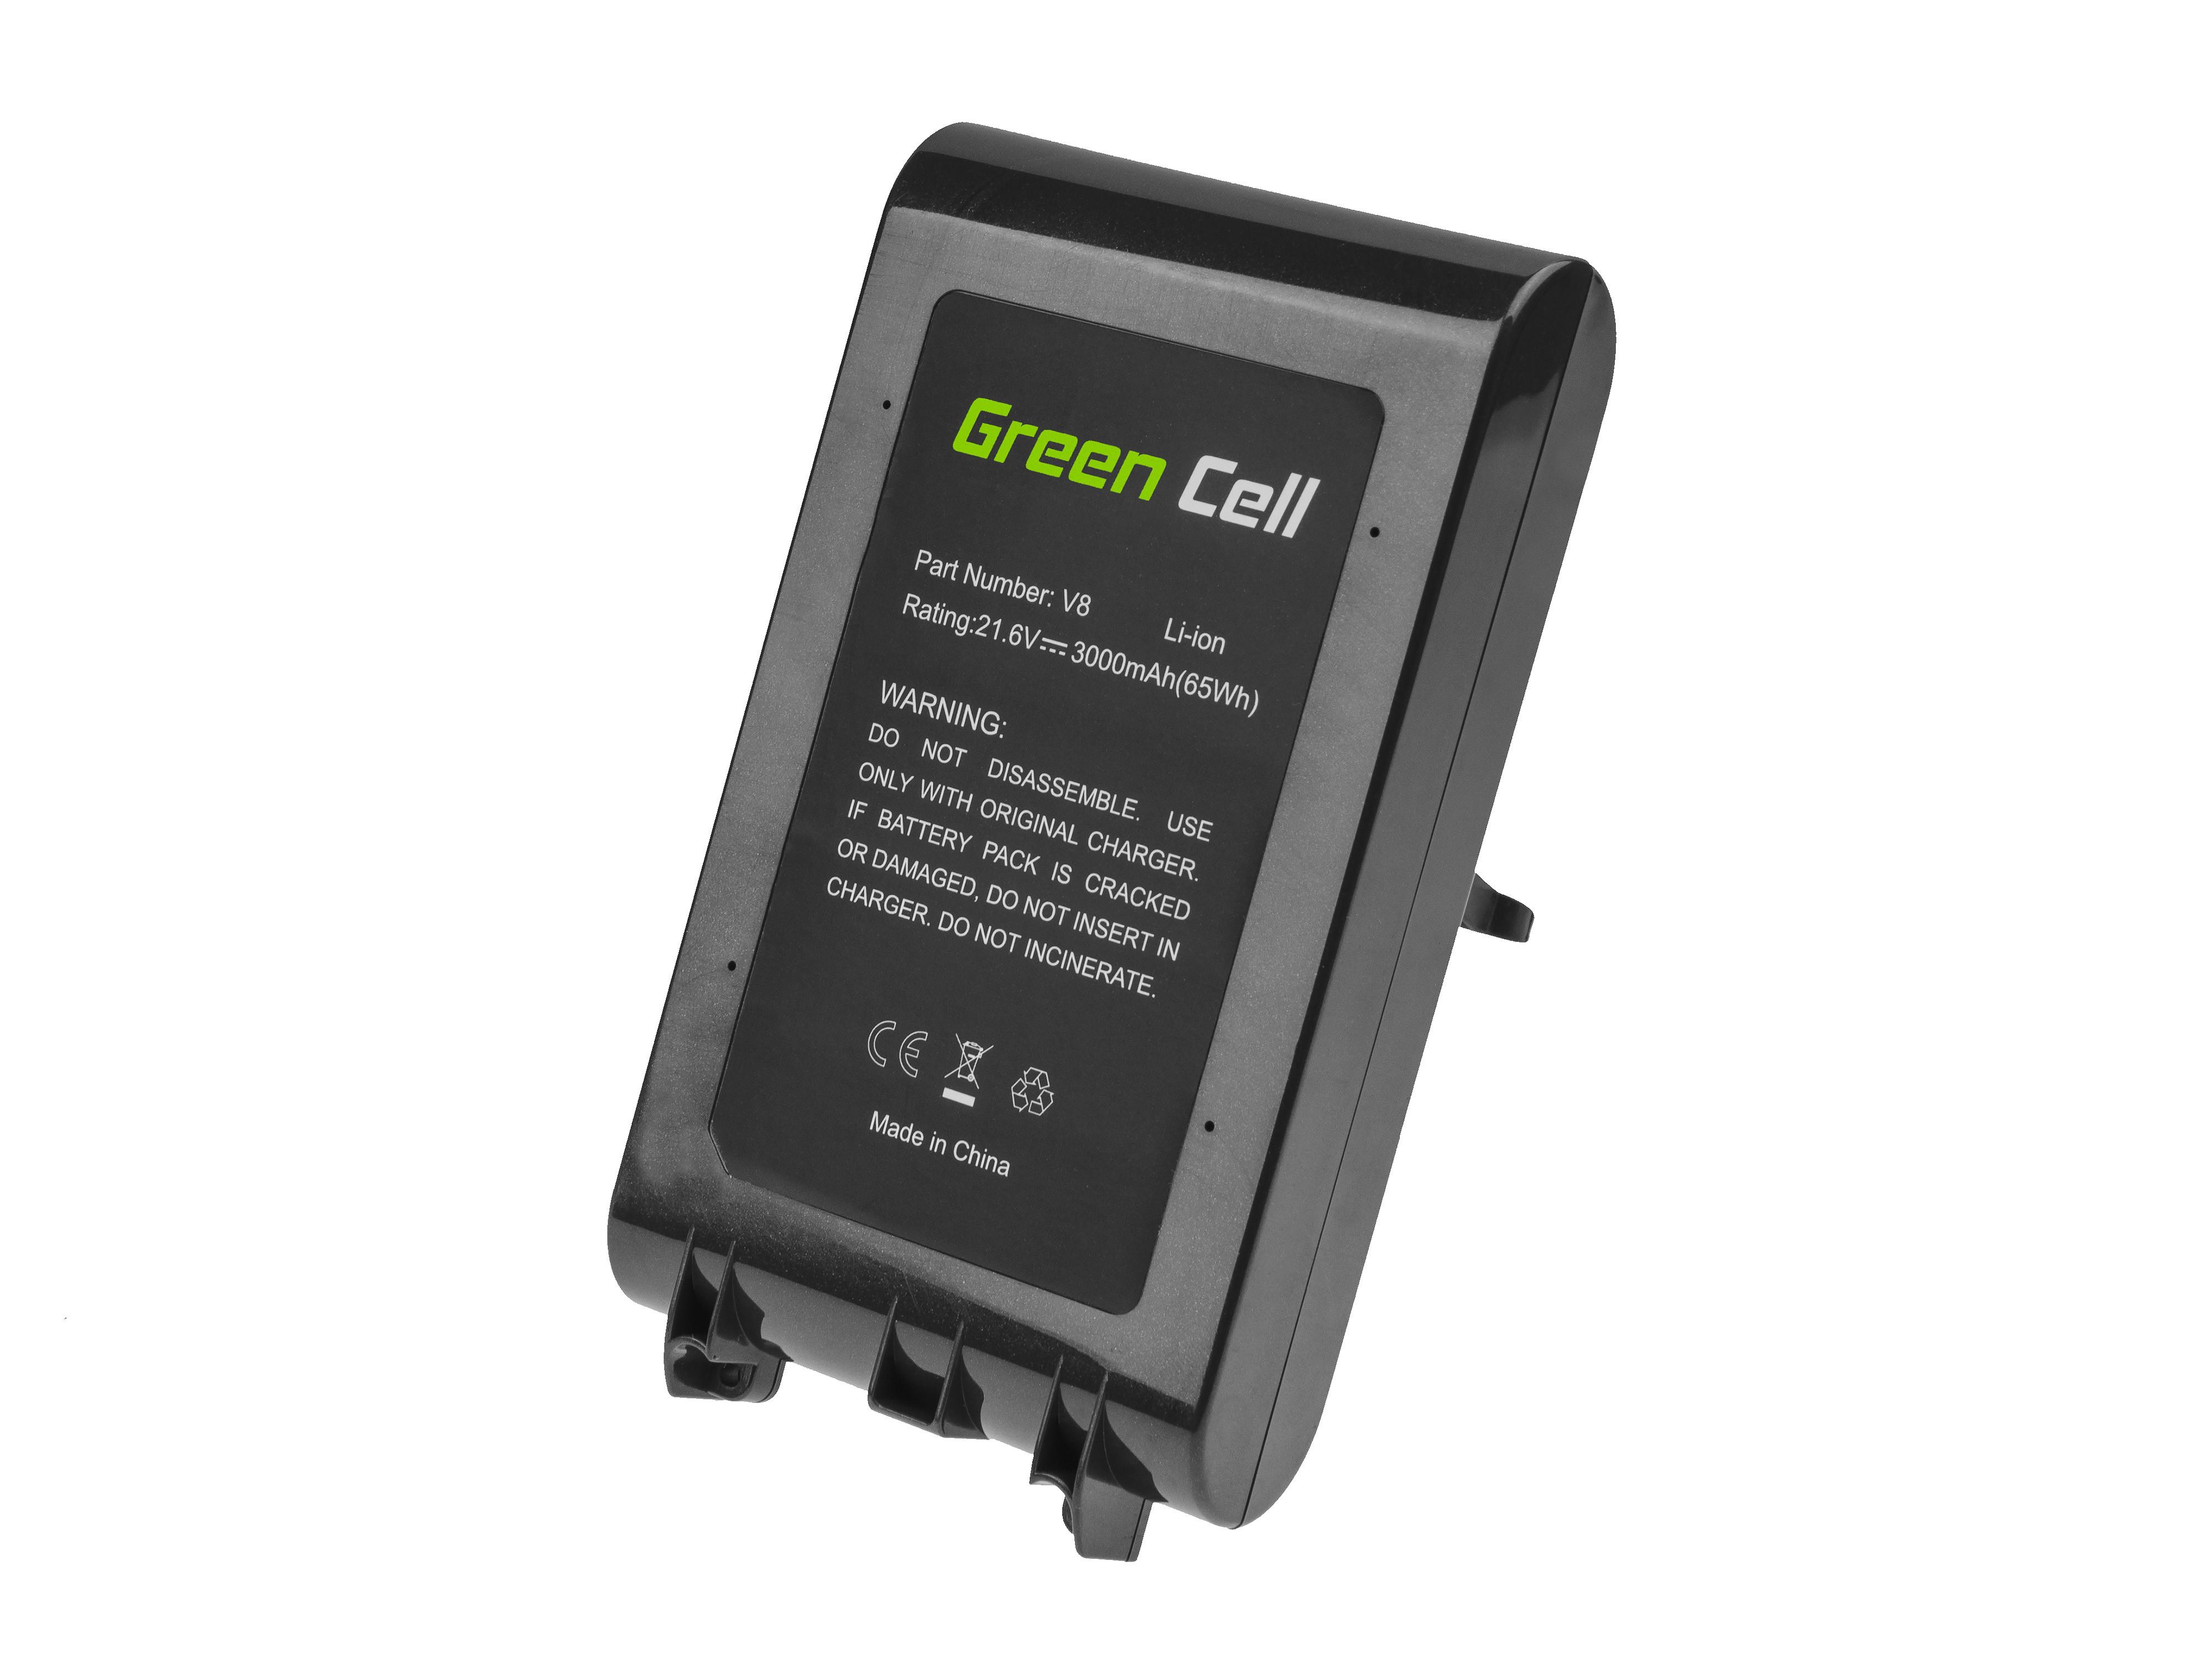 Green Cell PT229 Baterie Dyson 967834-02 967834-05, Dyson V8 SV10 Absolute Pro Vacuum Animal Plus 3000mAh Li-ion - neoriginální